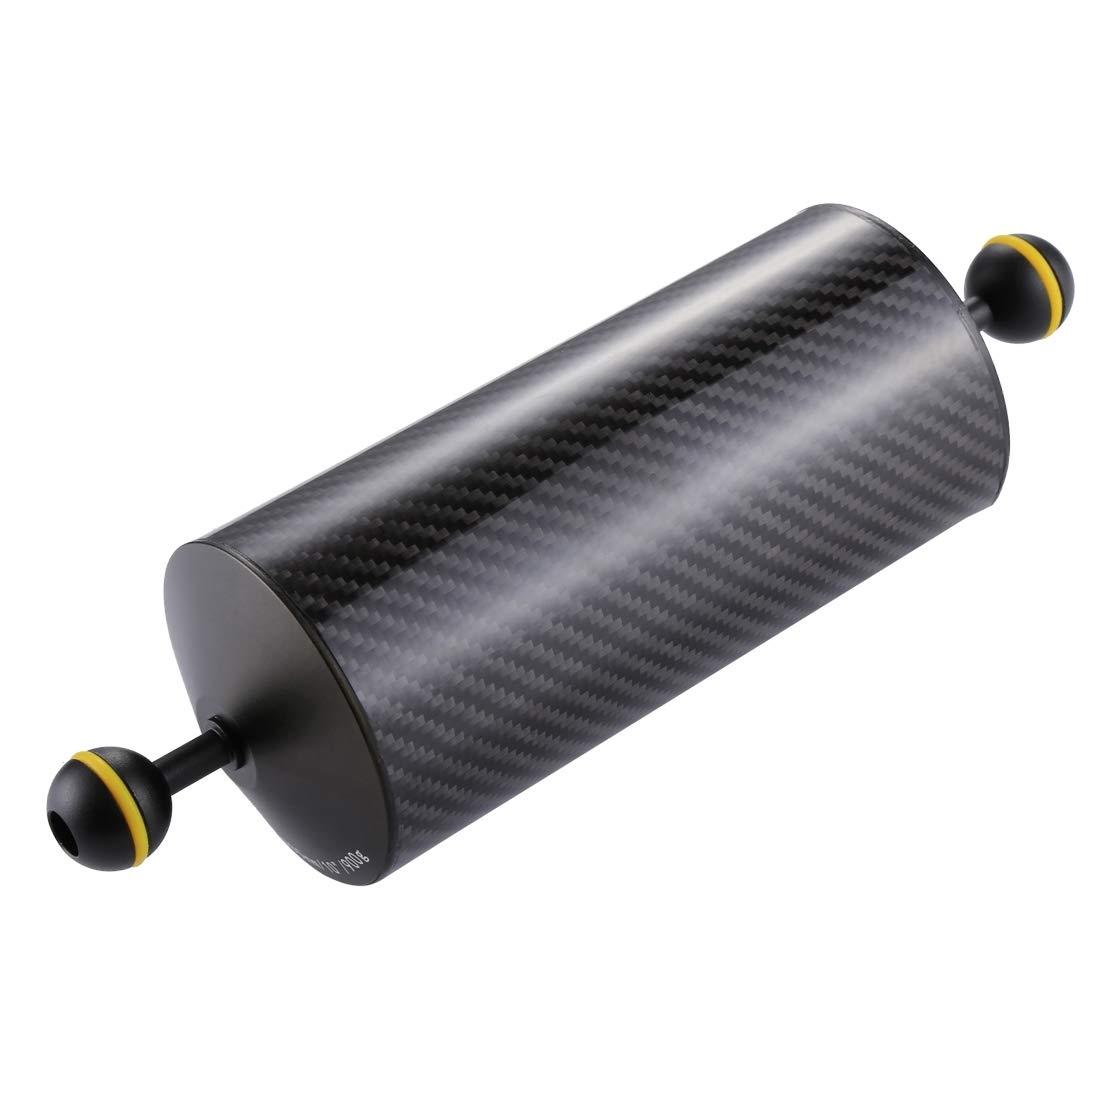 XIAOMIN 10.8 inch 27.5cm Length 80mm Diameter Dual Balls Carbon Fiber Floating Arm, Ball Diameter: 25mm, Buoyancy: 900g Premium Material by XIAOMIN